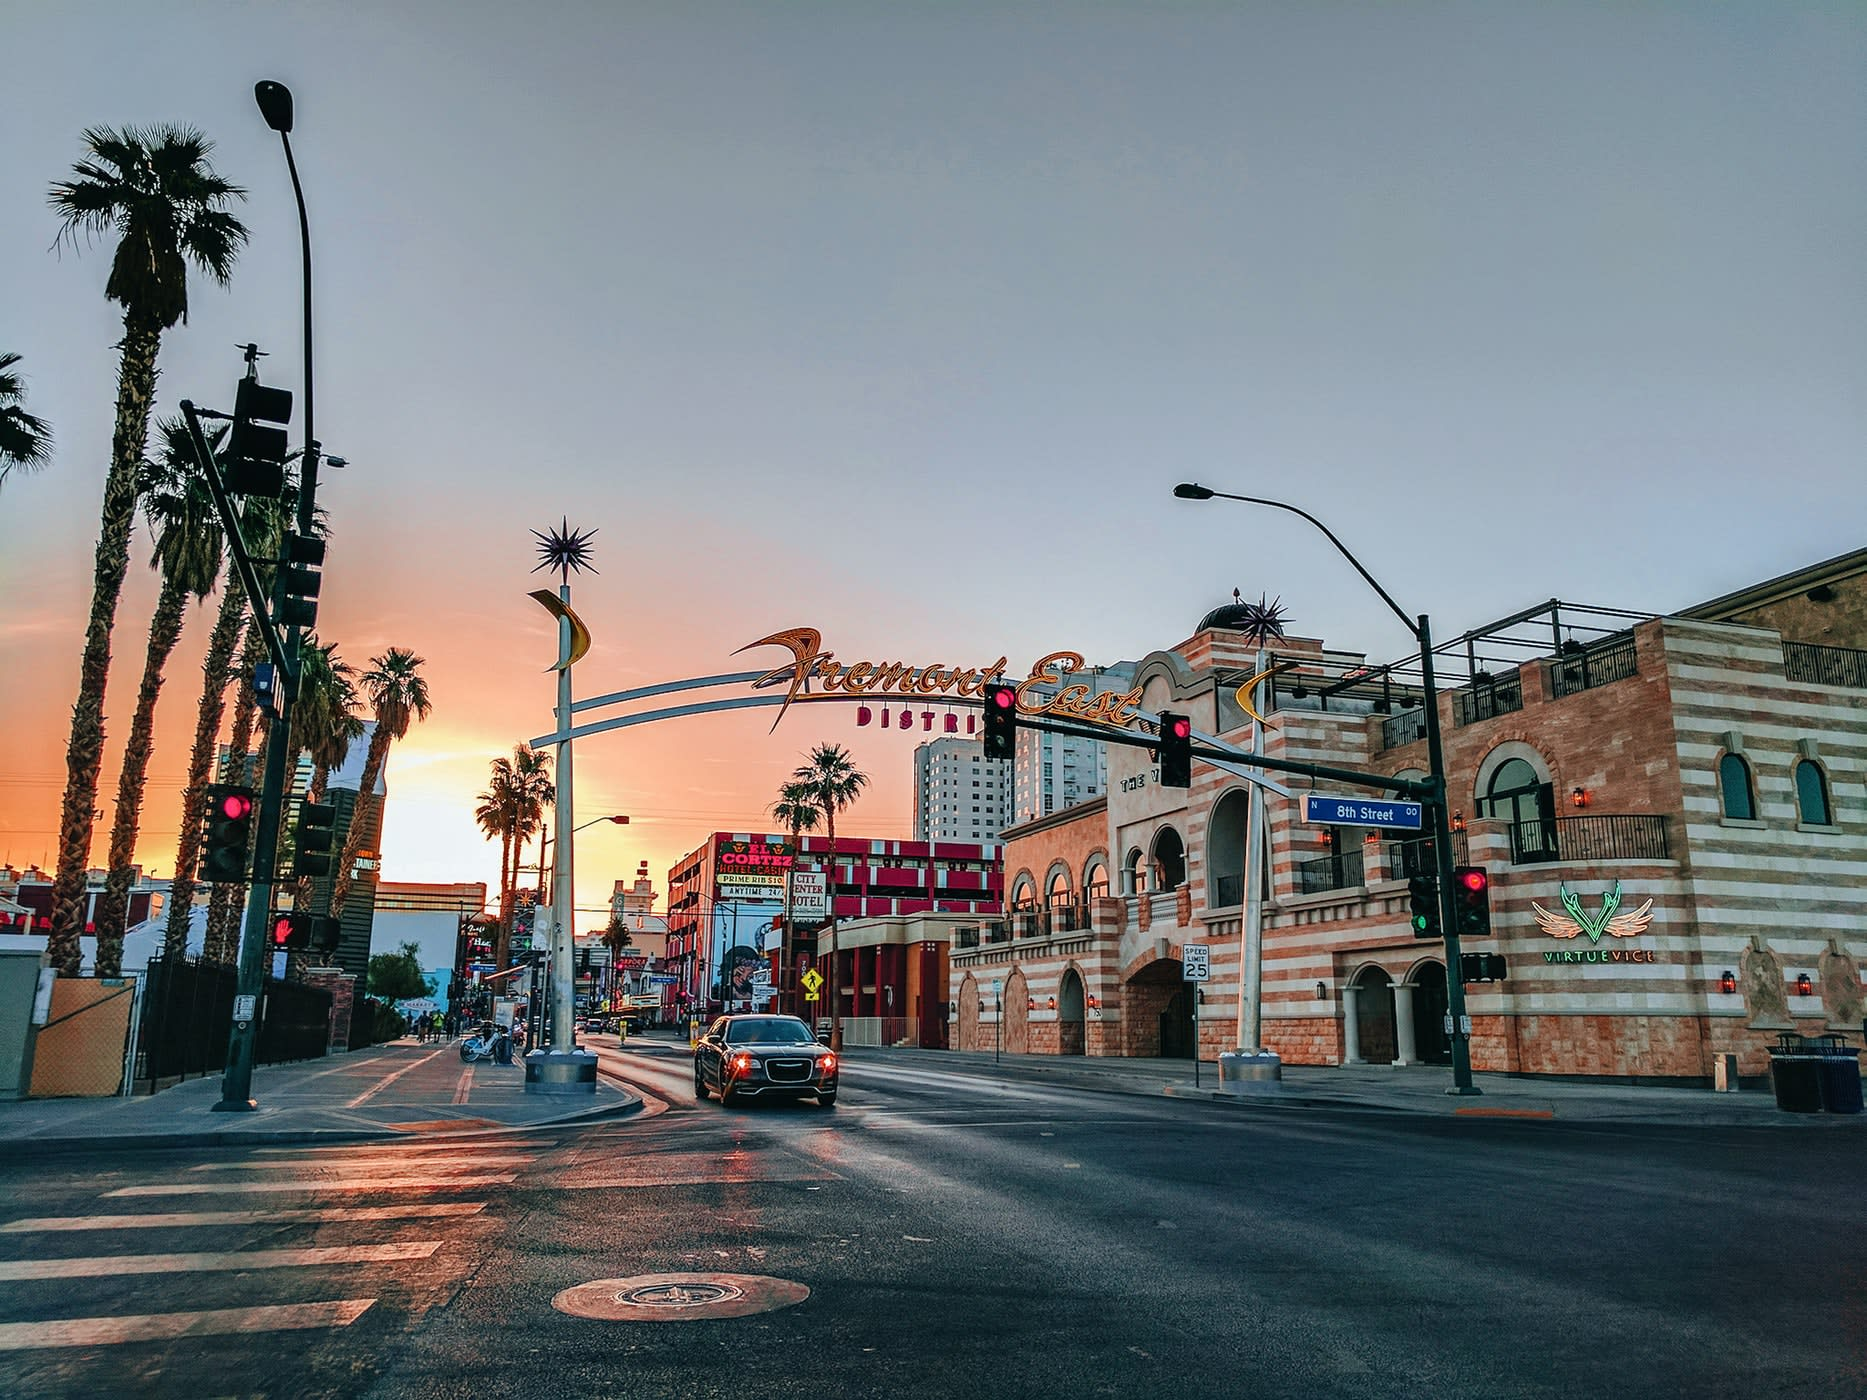 Greentube добавляет Cops 'n' Robbers Vegas Nights в свой стиль Лас-Вегаса